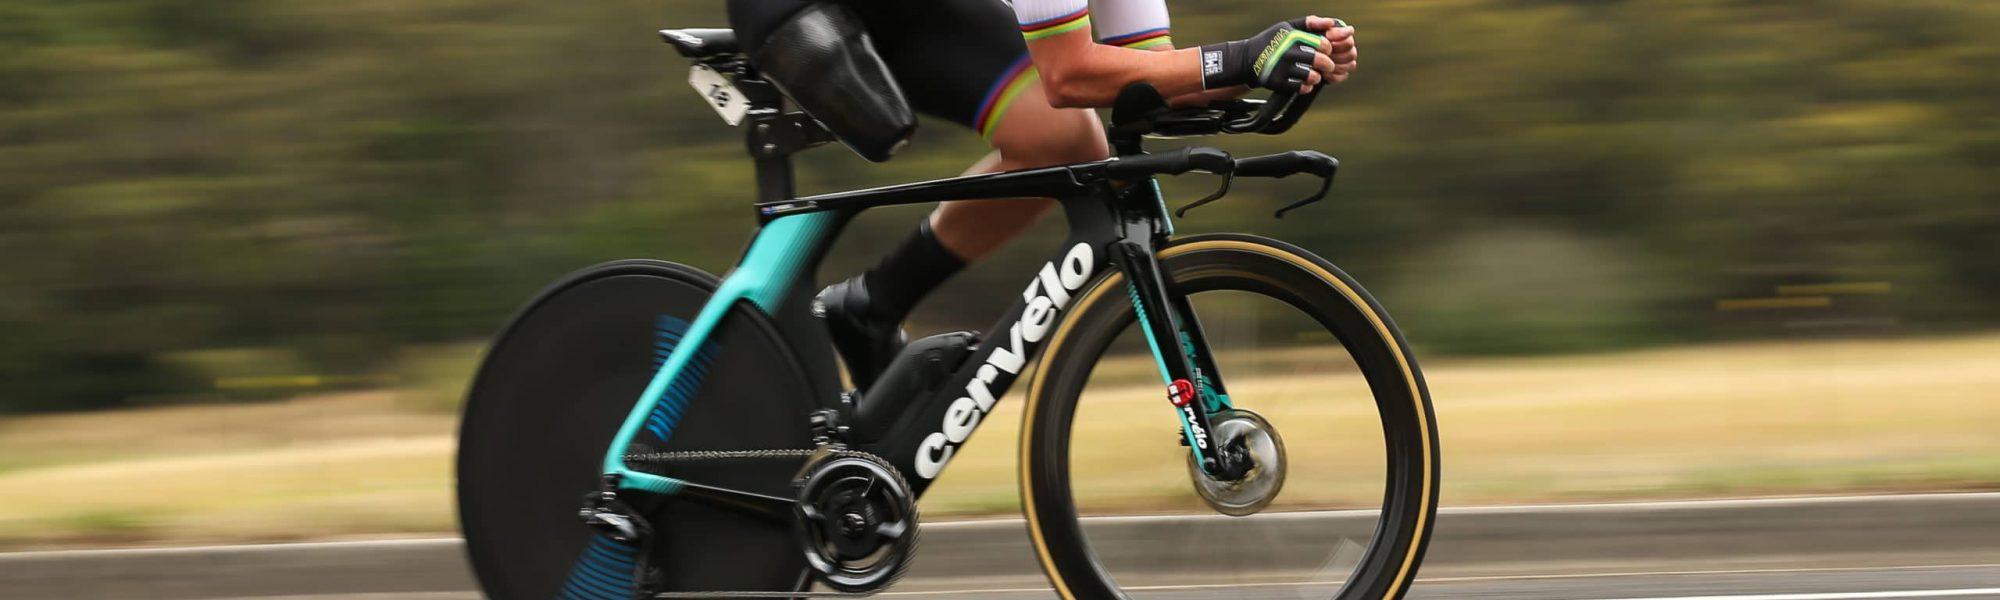 4/2/21-Ballarat/Buninyong AusCycling2021 Federation University Road National Championships  Para-Cycling Individual Time Trial  (Photo by Con Chronis/AusCycling)